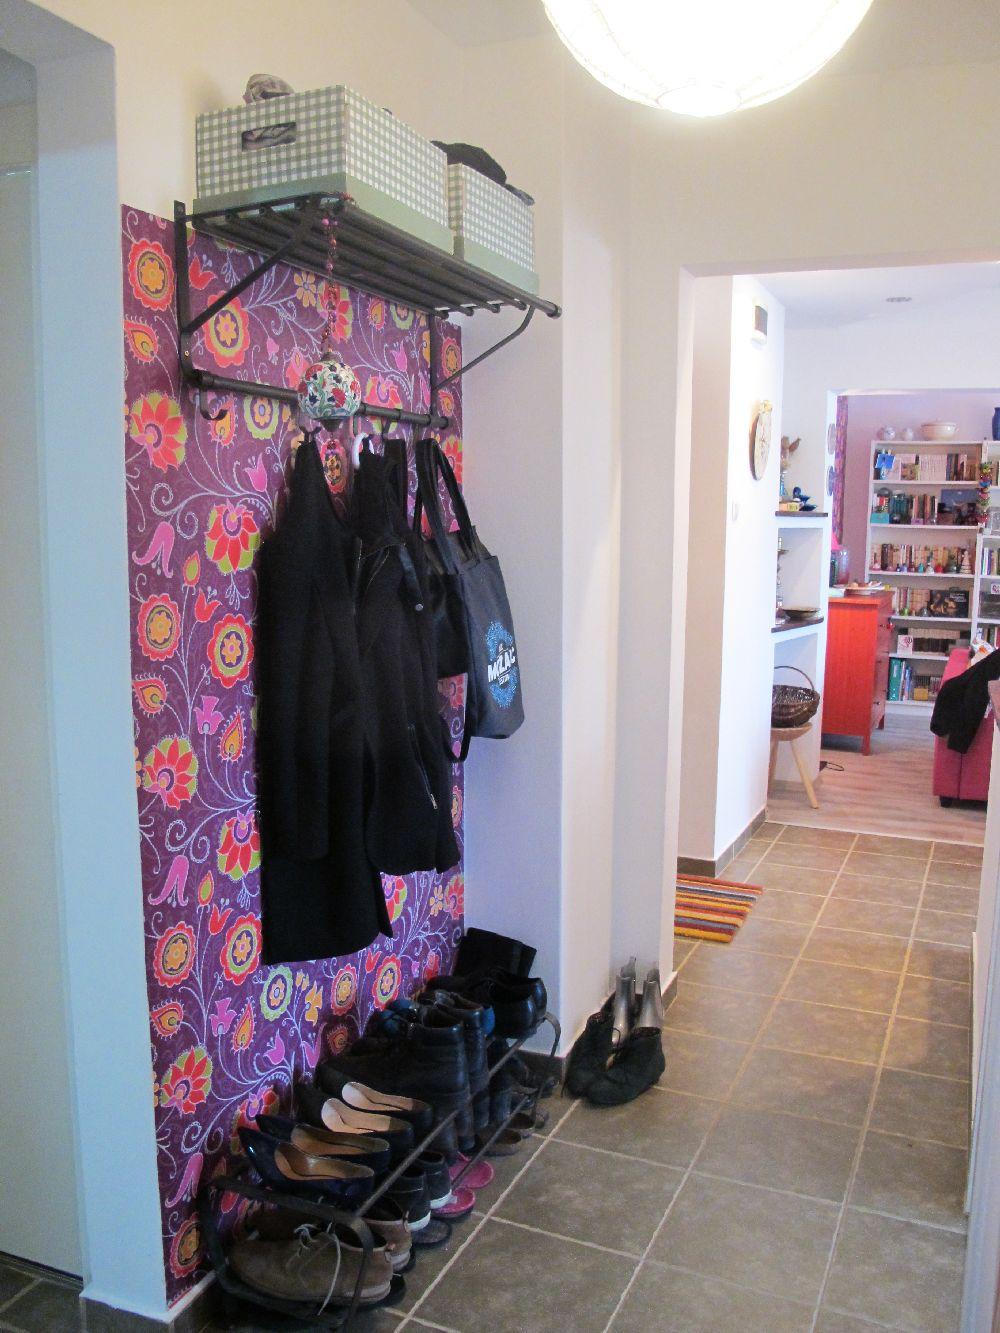 adelaparvu.com despre apartament 3 camere colorat in Sibiu, Foto Adela Parvu (92)